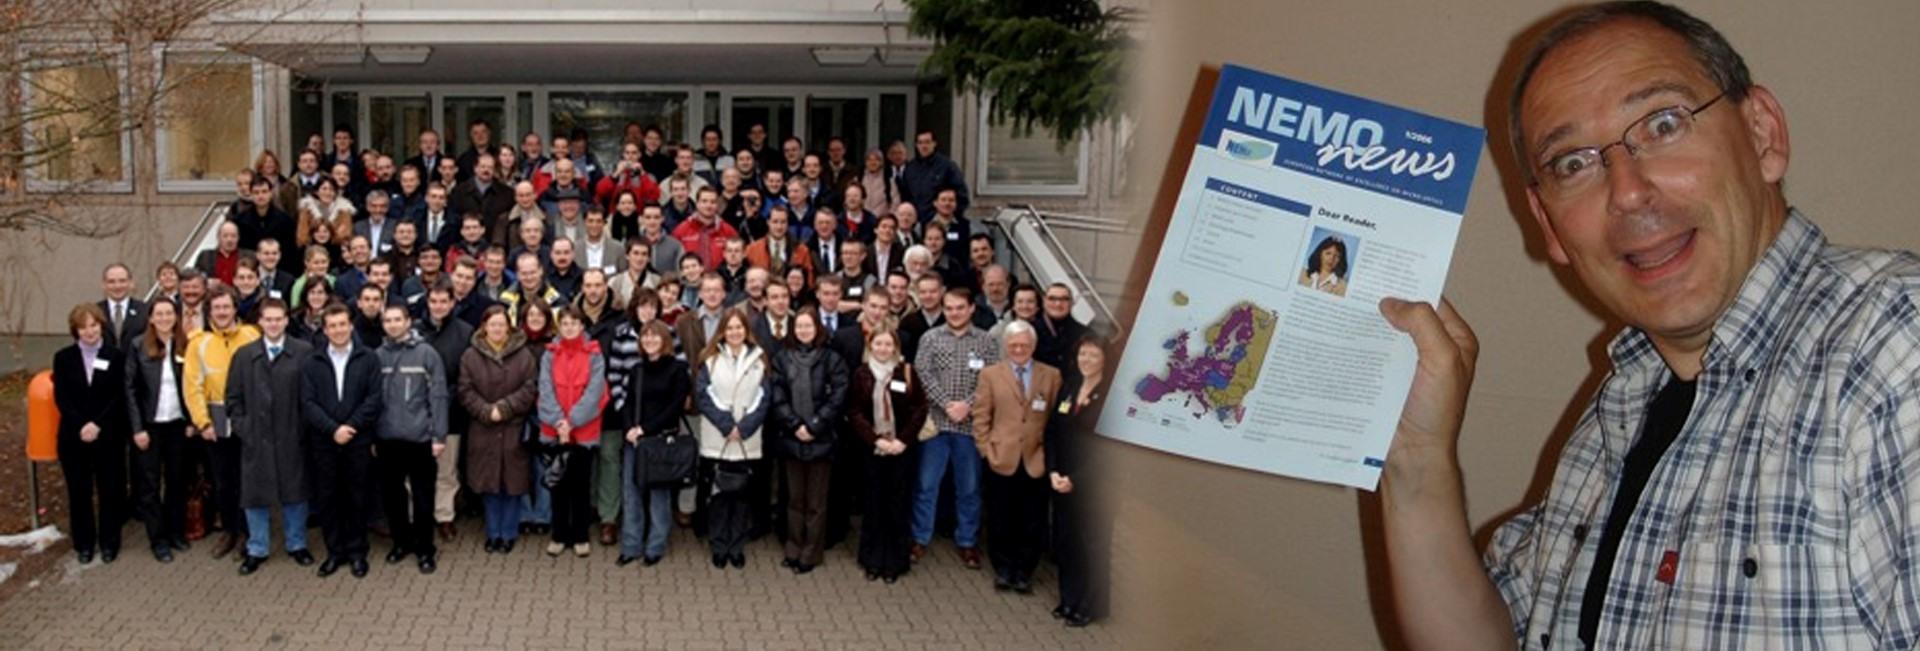 NEMO consortium newsletter Large